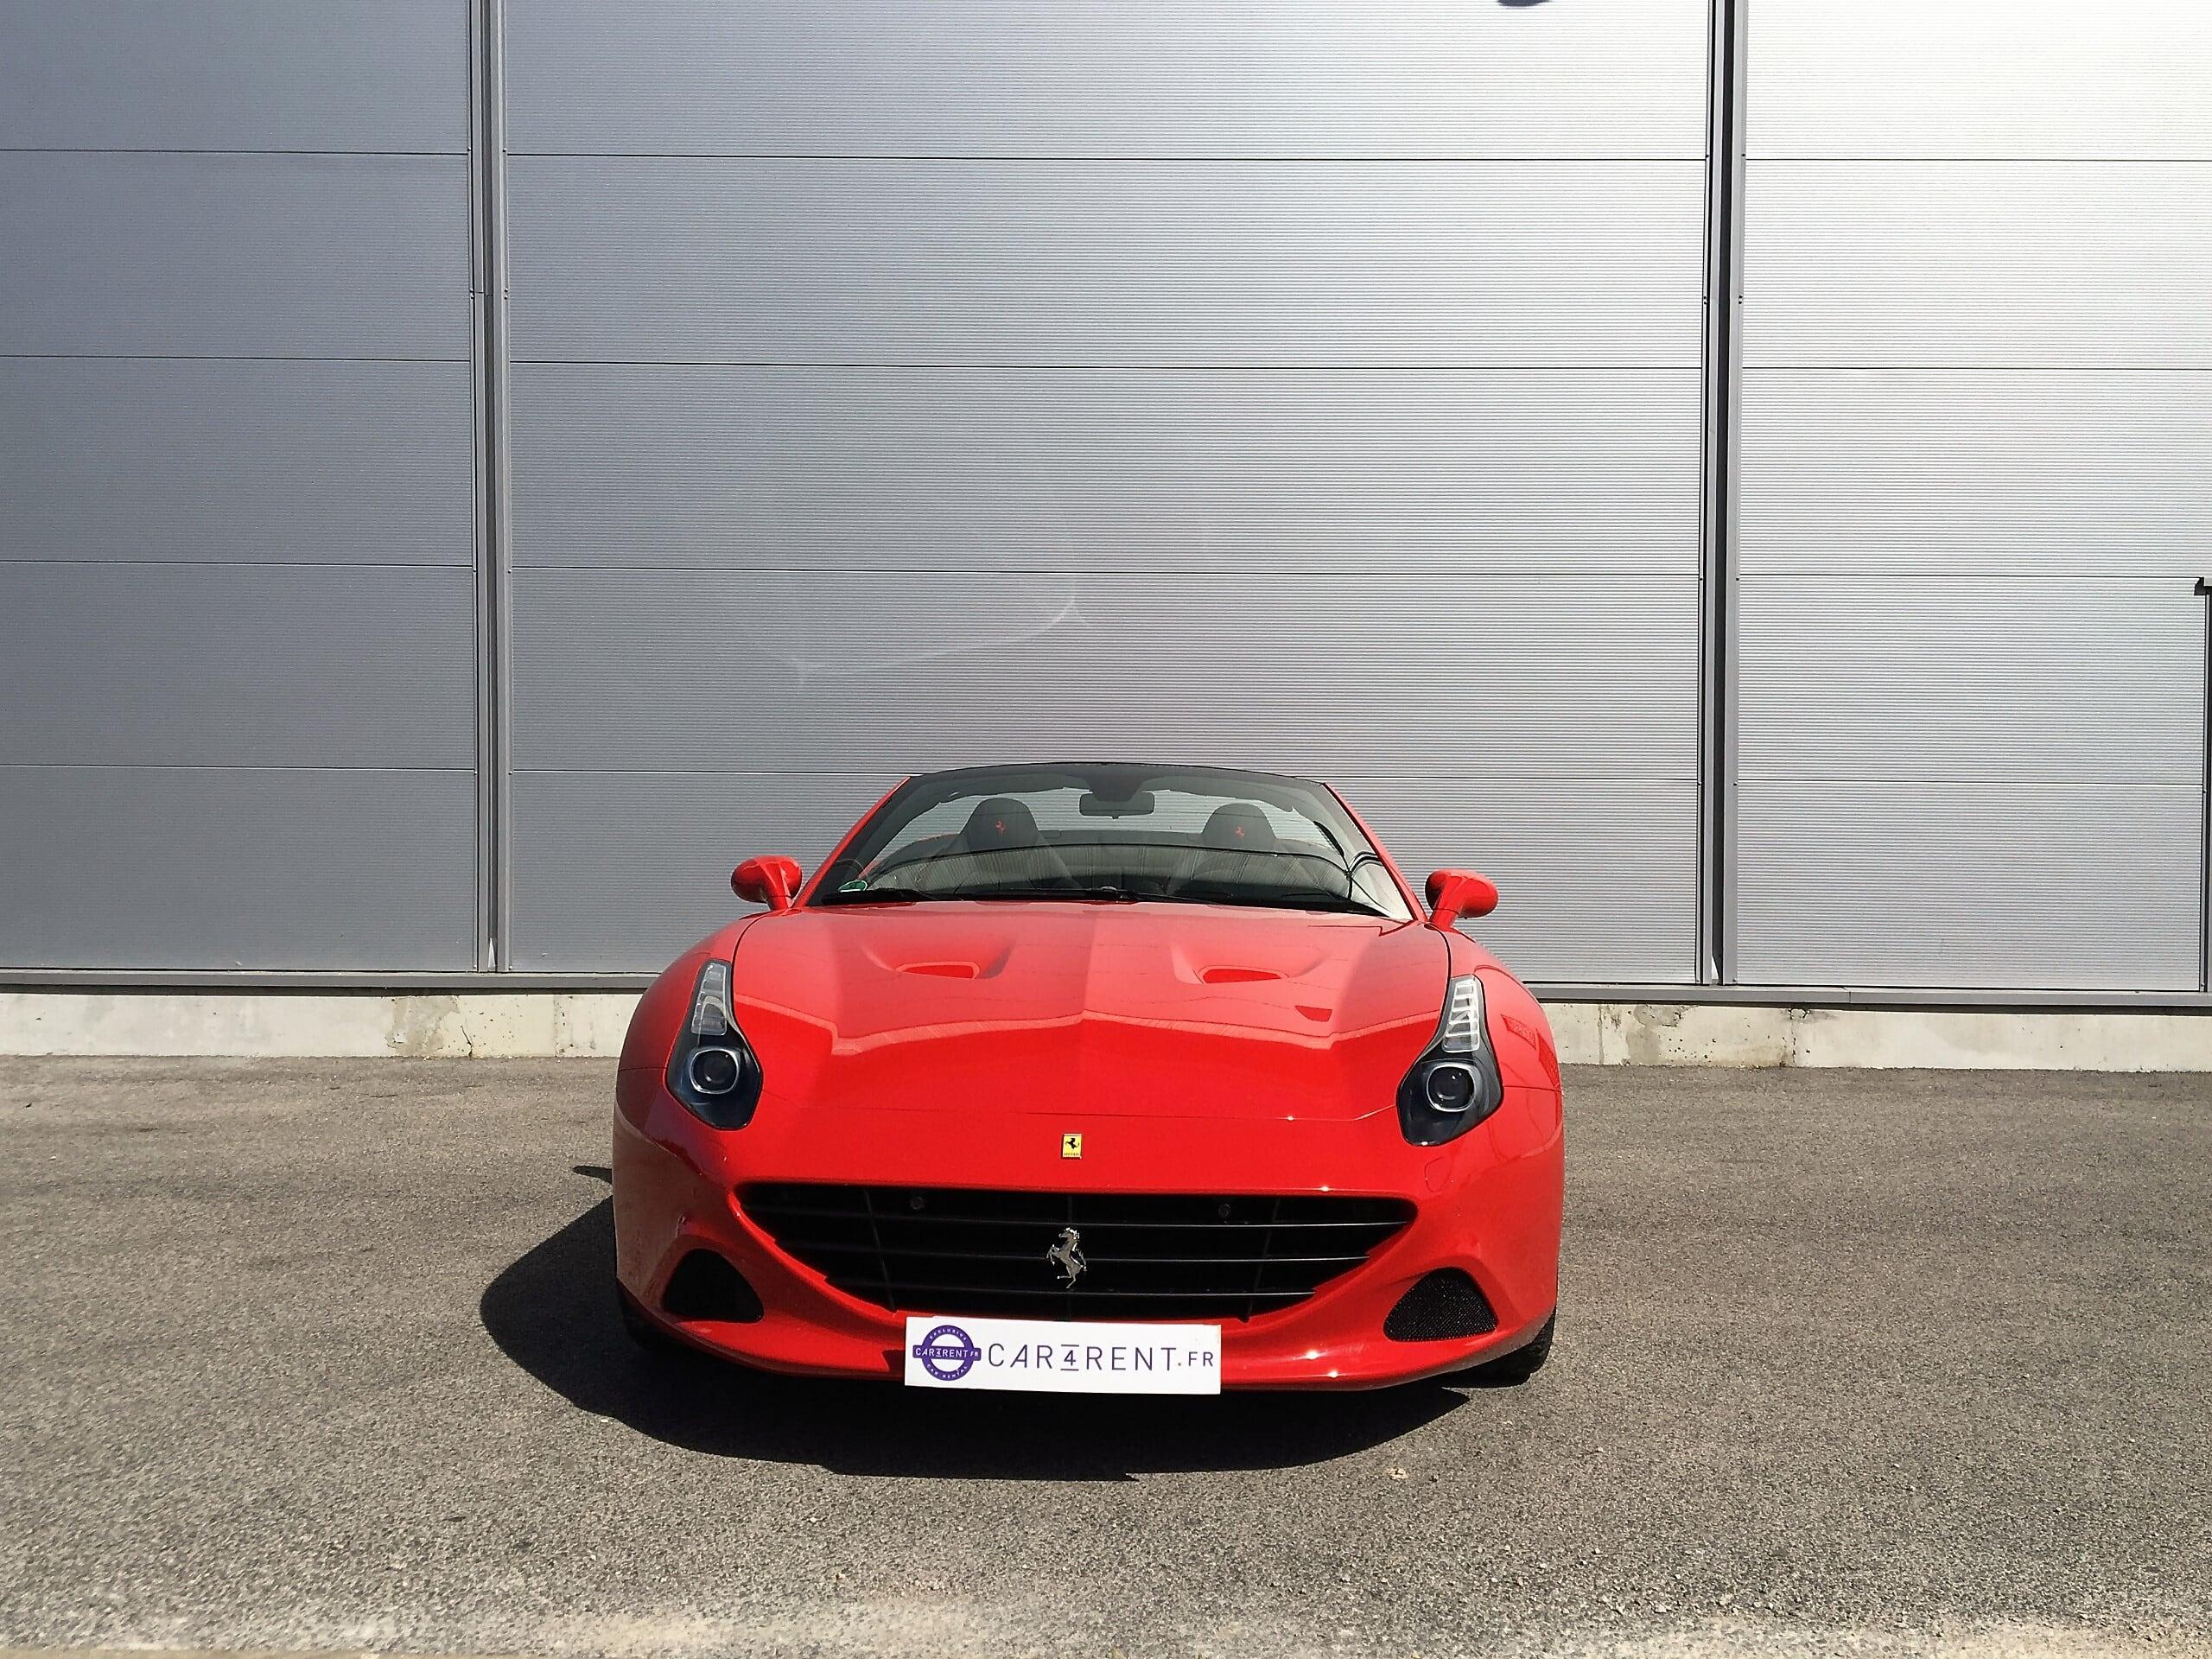 hire ferrari california T Cannes with car4rent